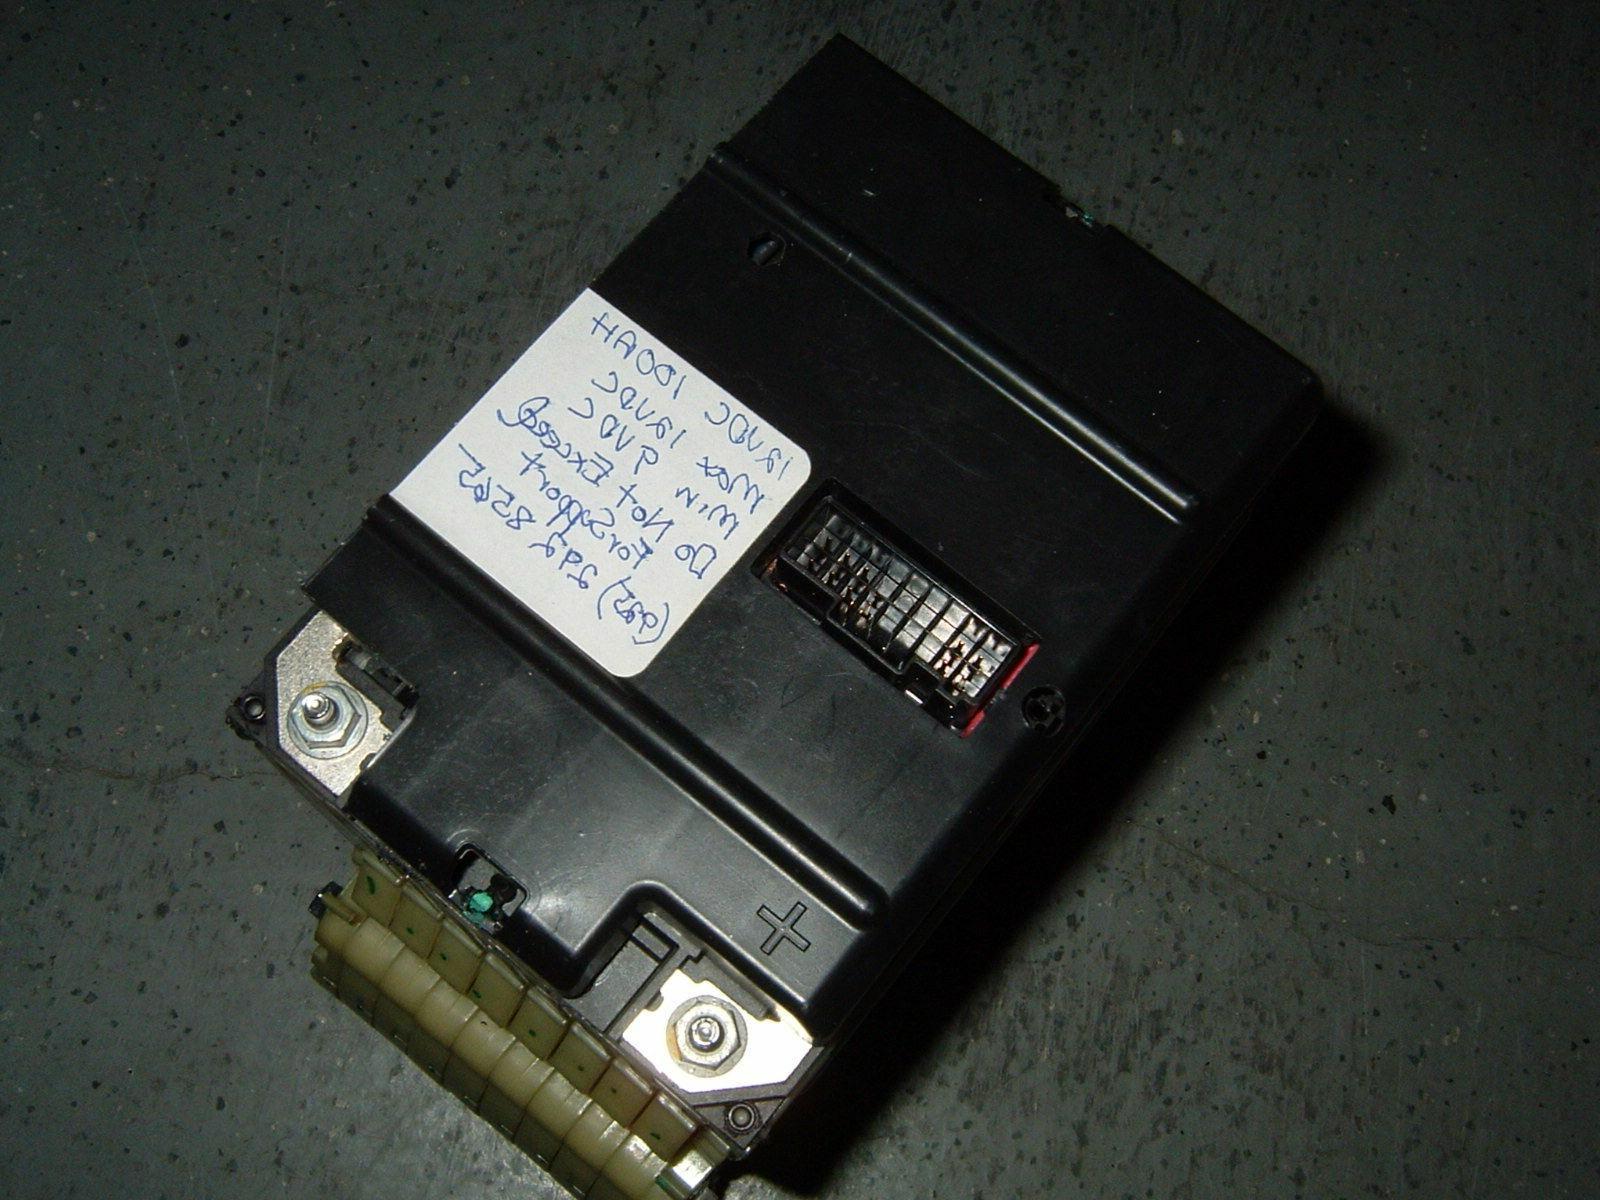 lithium ion chevy volt 12vdc 100ah new